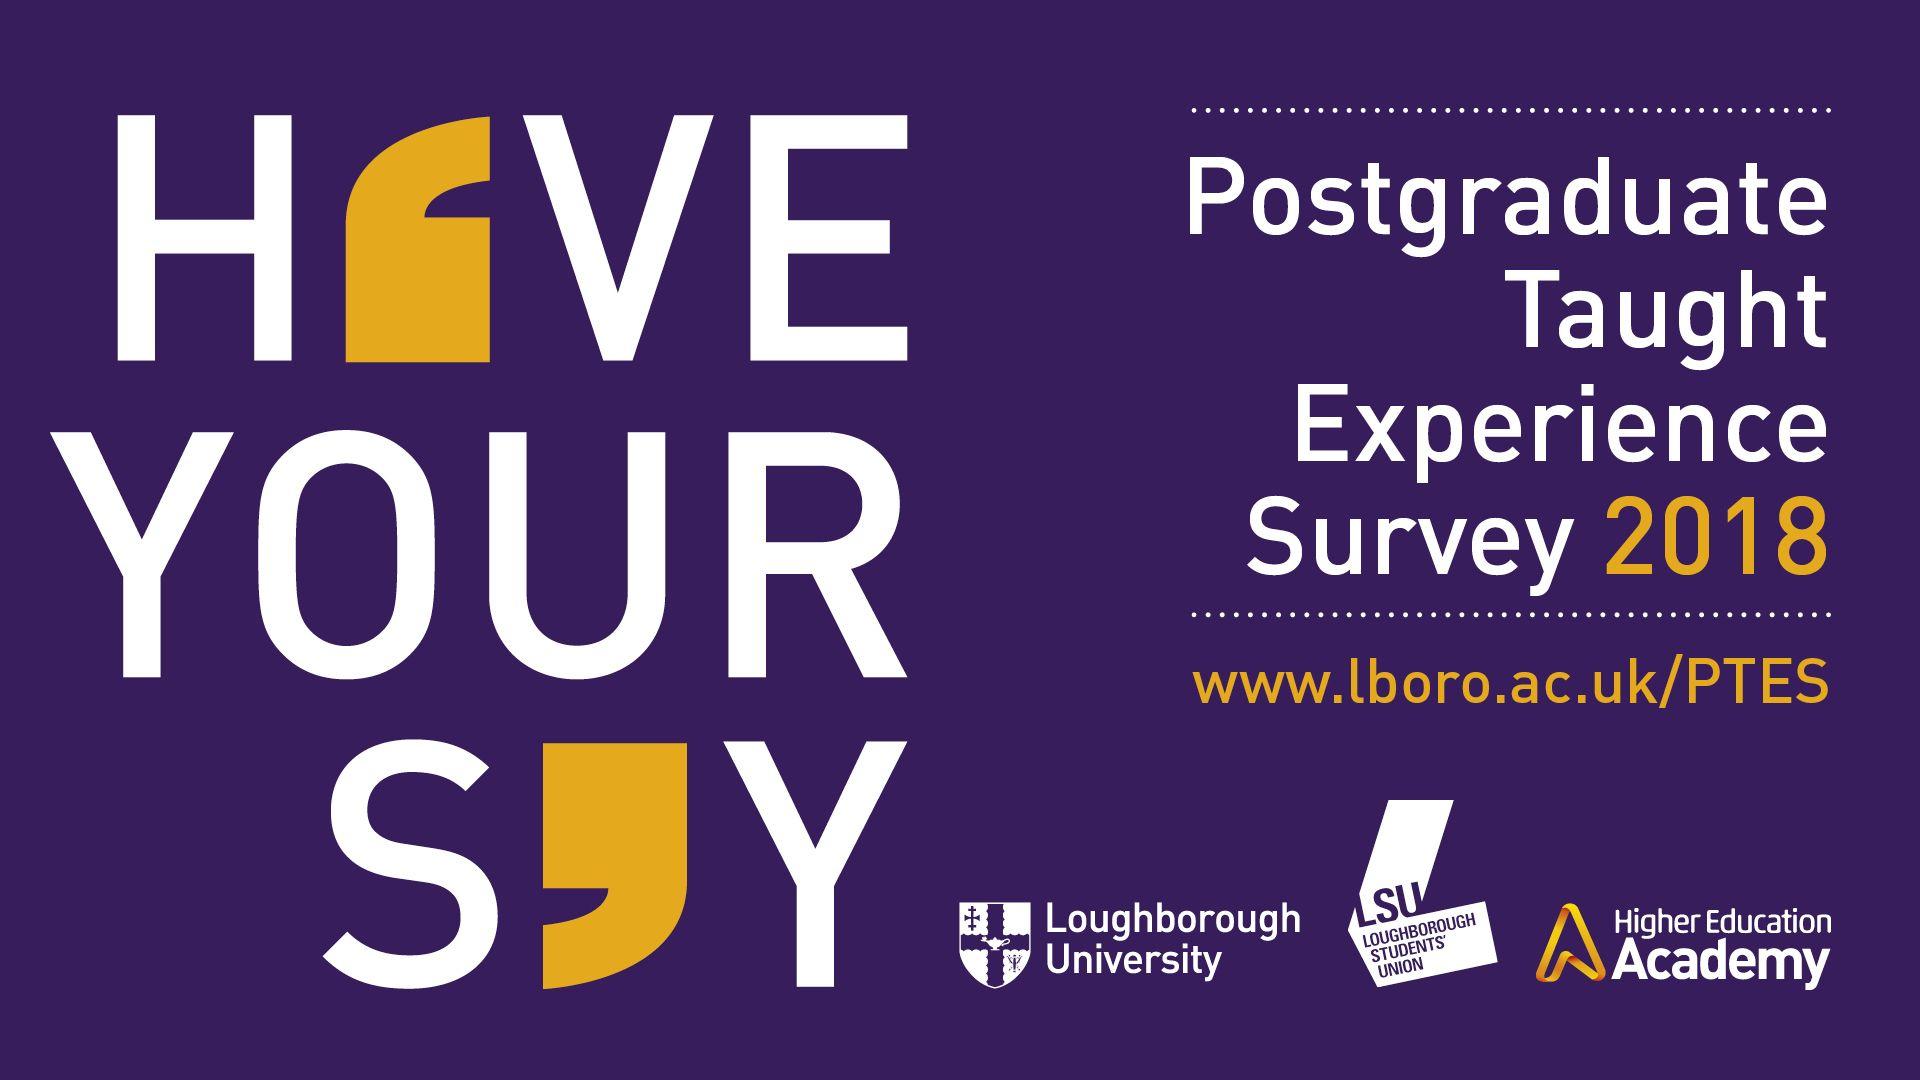 Postgraduate Taught Experience Survey 2018